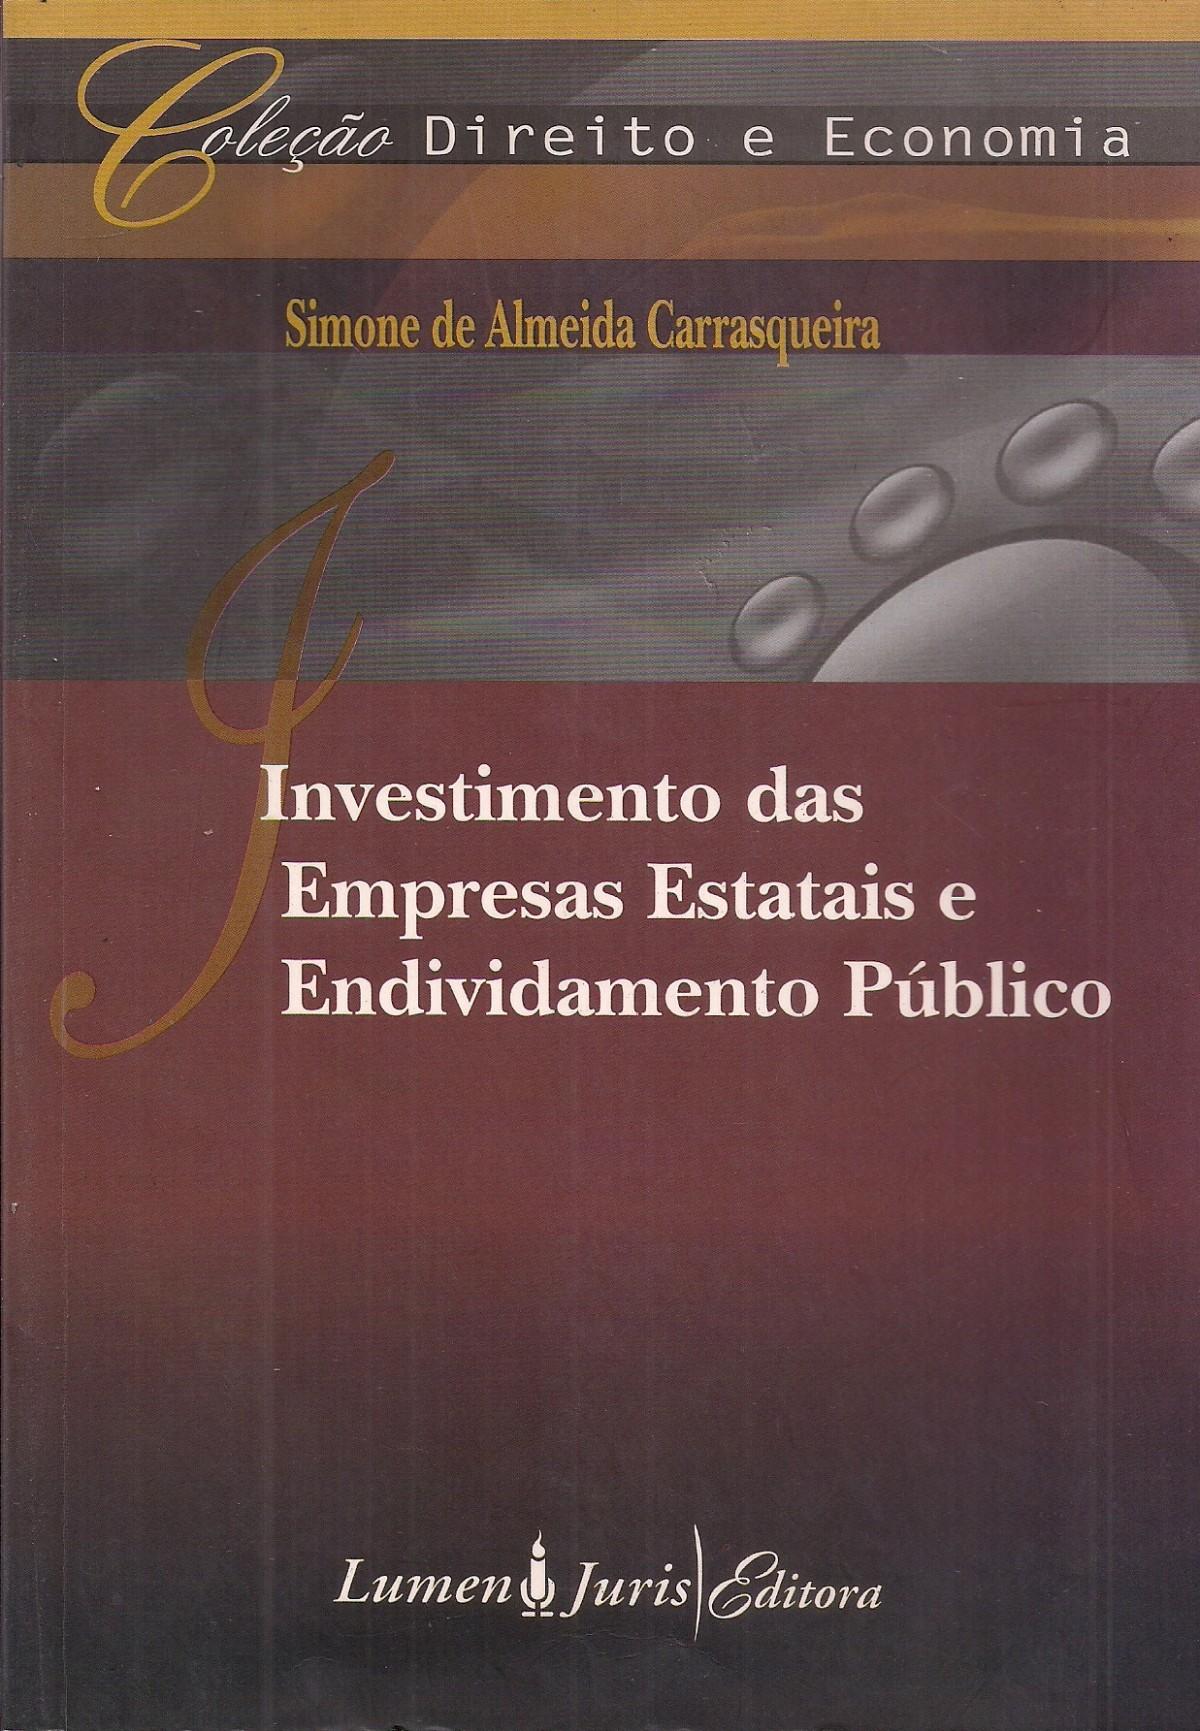 Foto 1 - Investimento Das Empresas Estatais E Endividamento Público